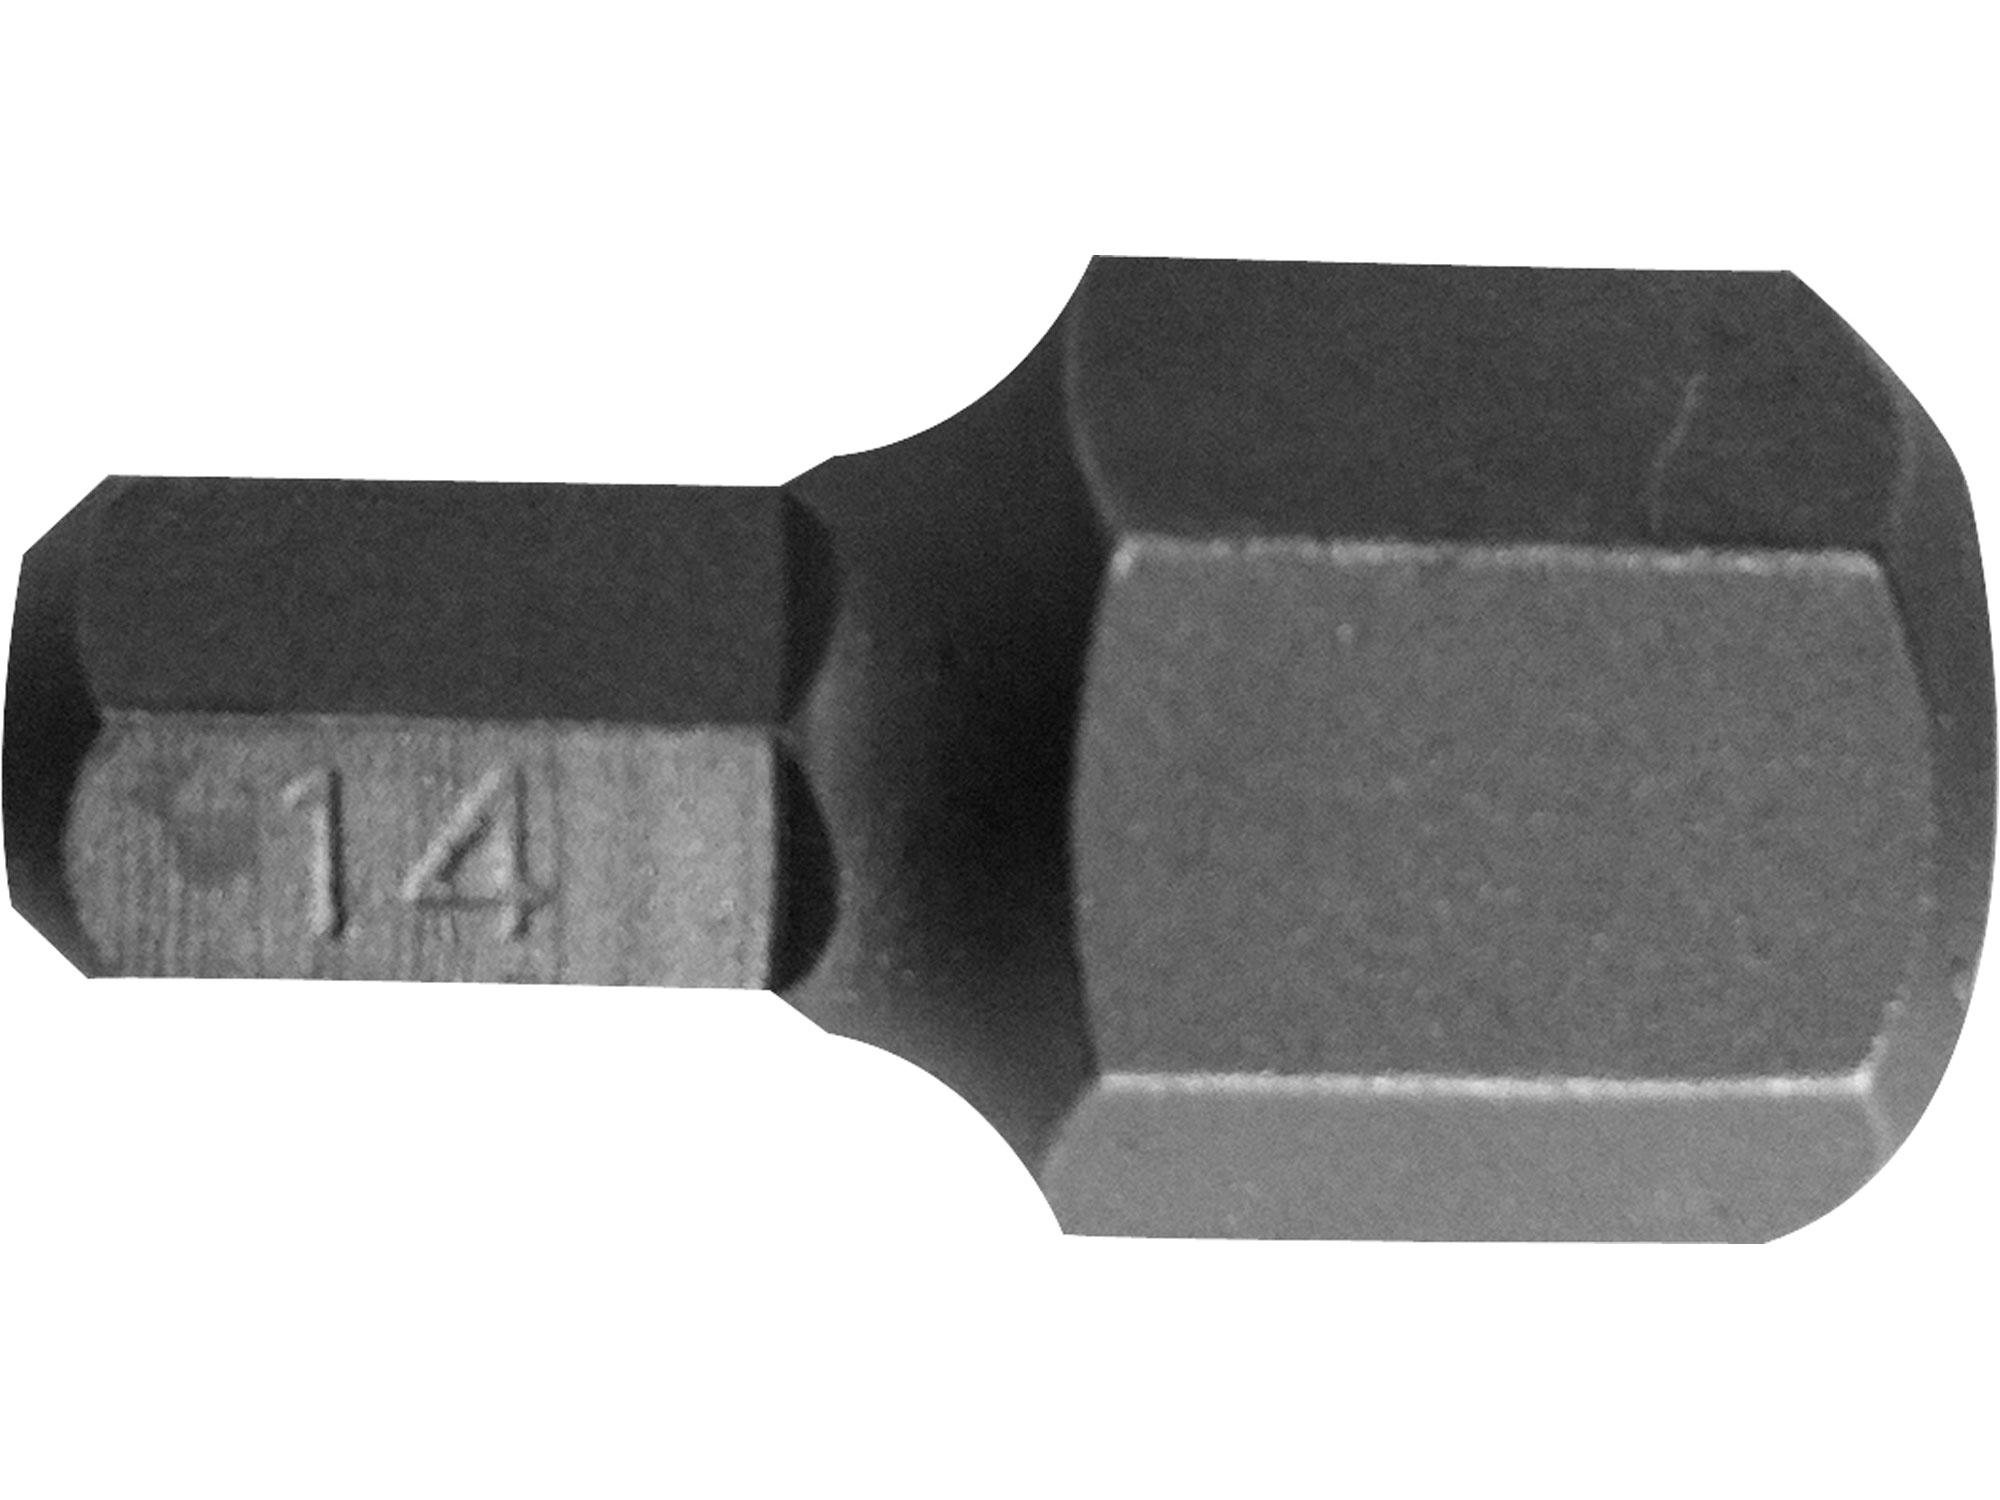 "hrot ius H14x30mm, stopka 8mm (5/16"") 6525-H14"